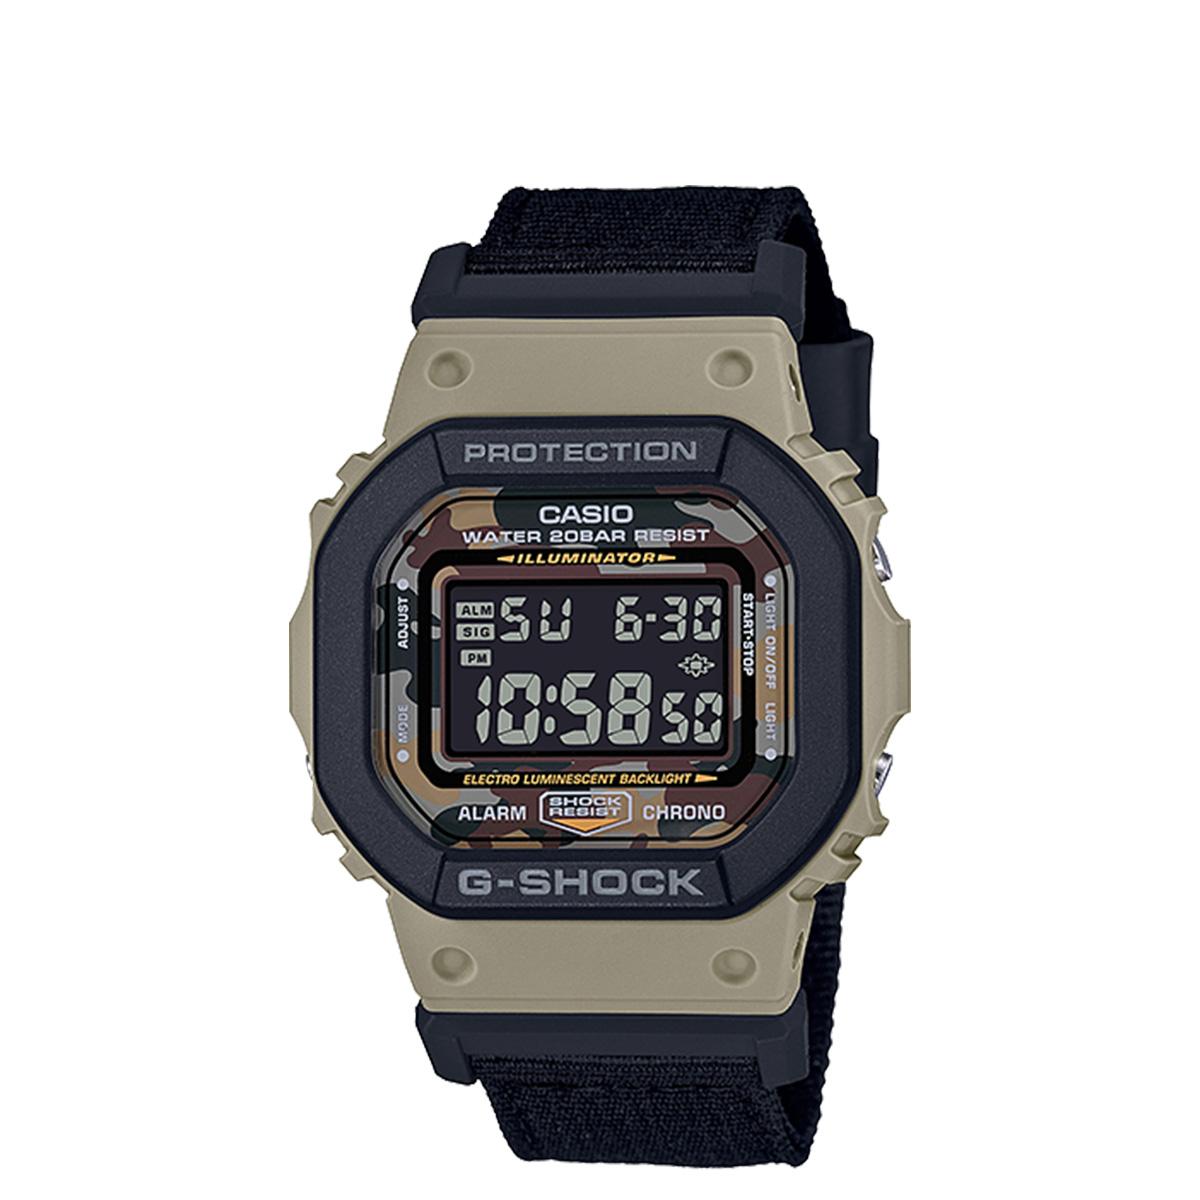 CASIO G-SHOCK カシオ 腕時計 DW-5610SUS-5JR メンズ レディース ブラック 黒 [3/19 新入荷]